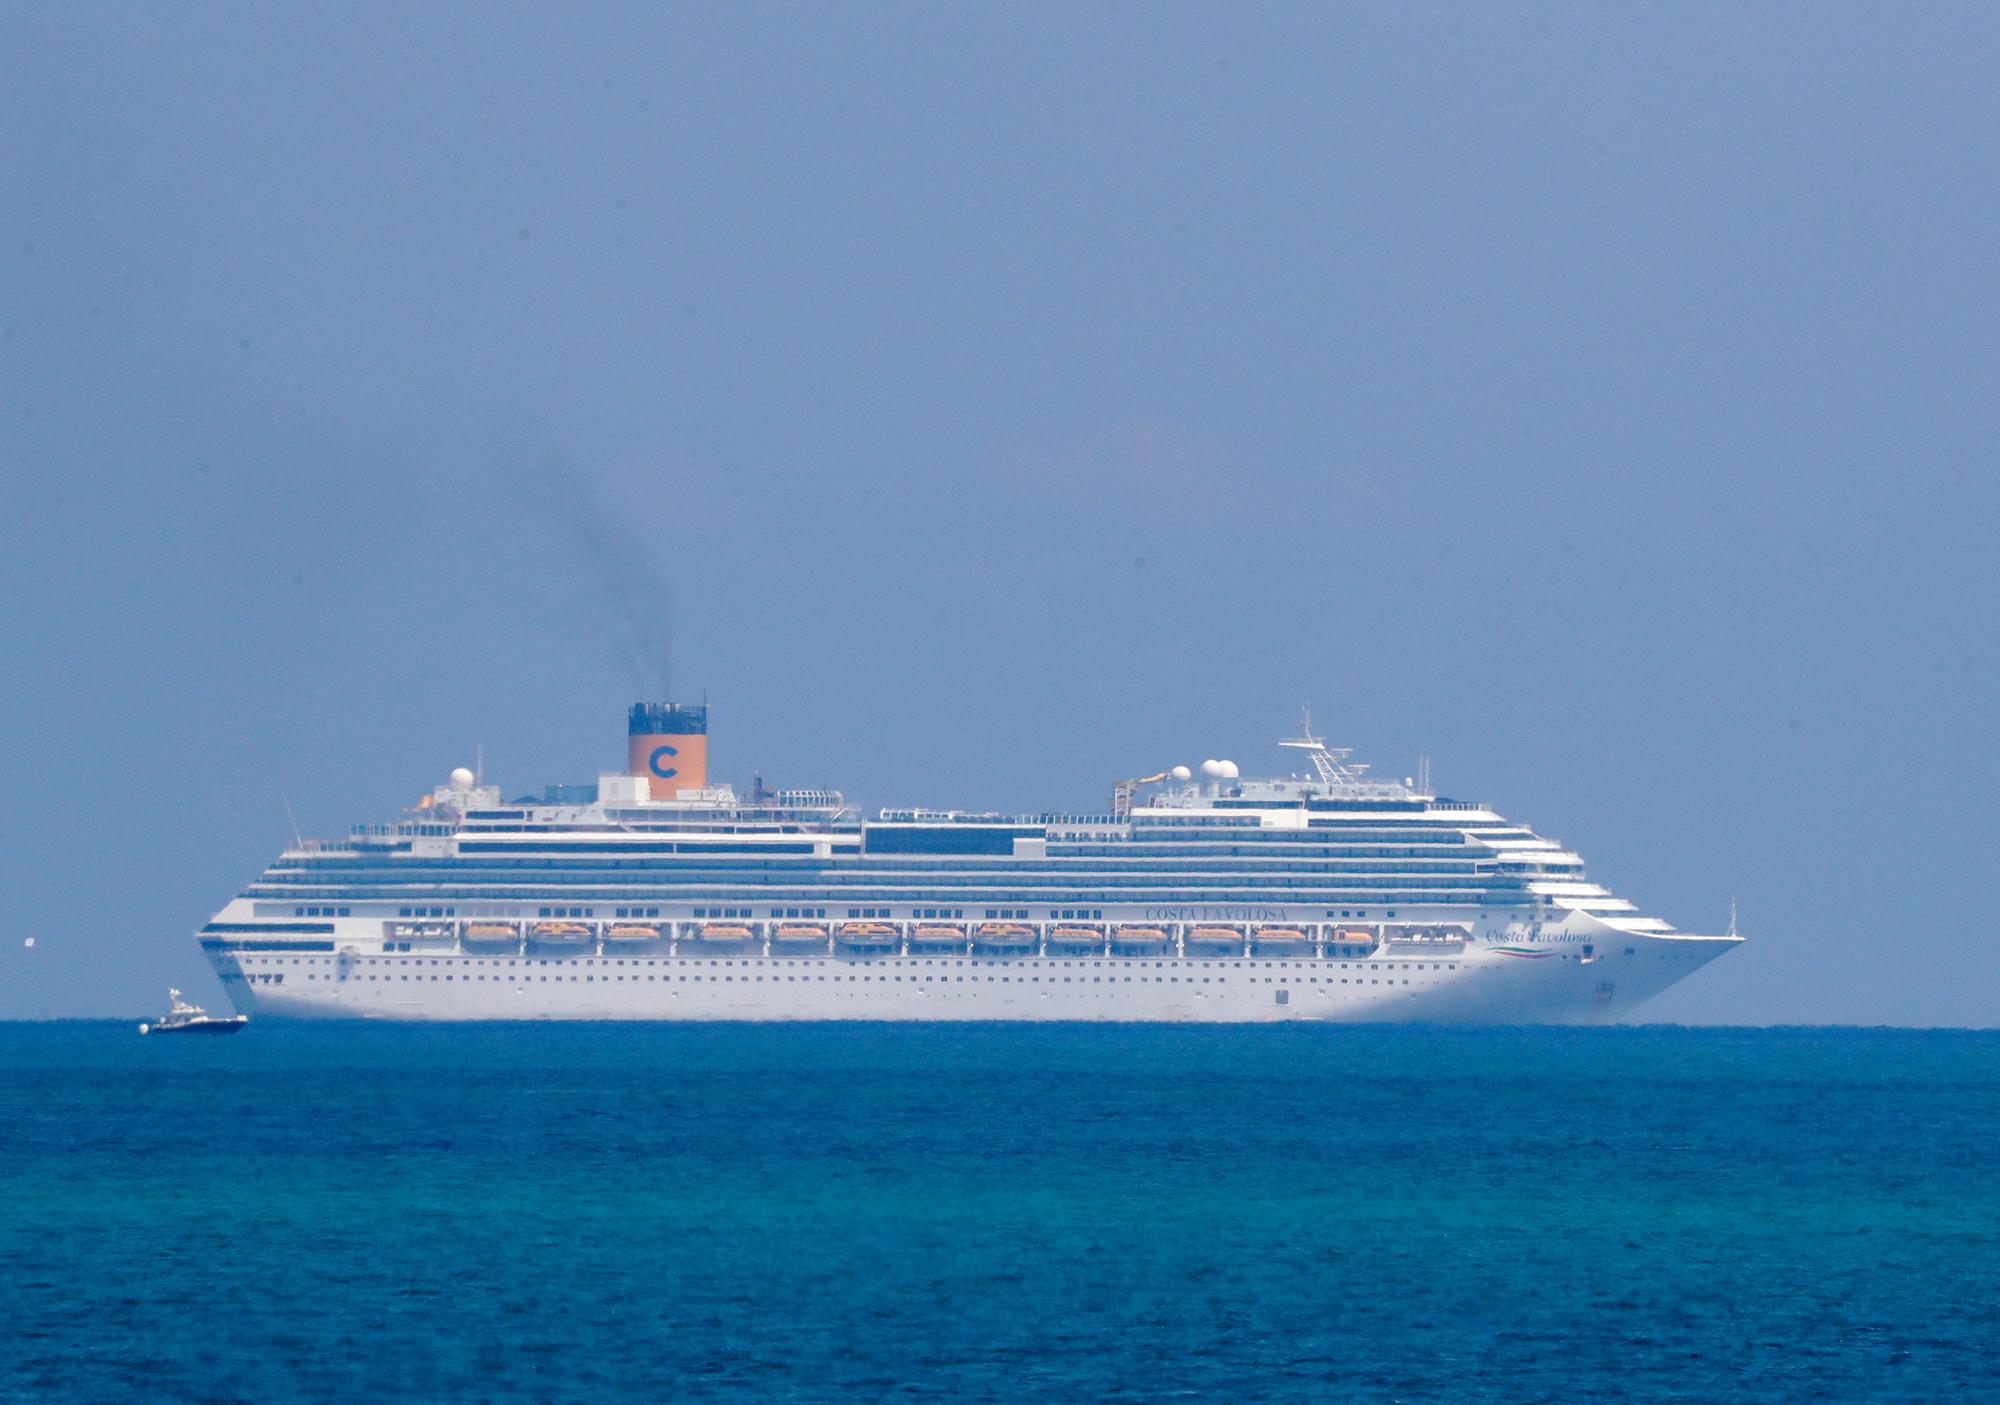 The Costa Cruise ship Favolosa is shown, Thursday, March 26, off the coast of Miami Beach, Florida.